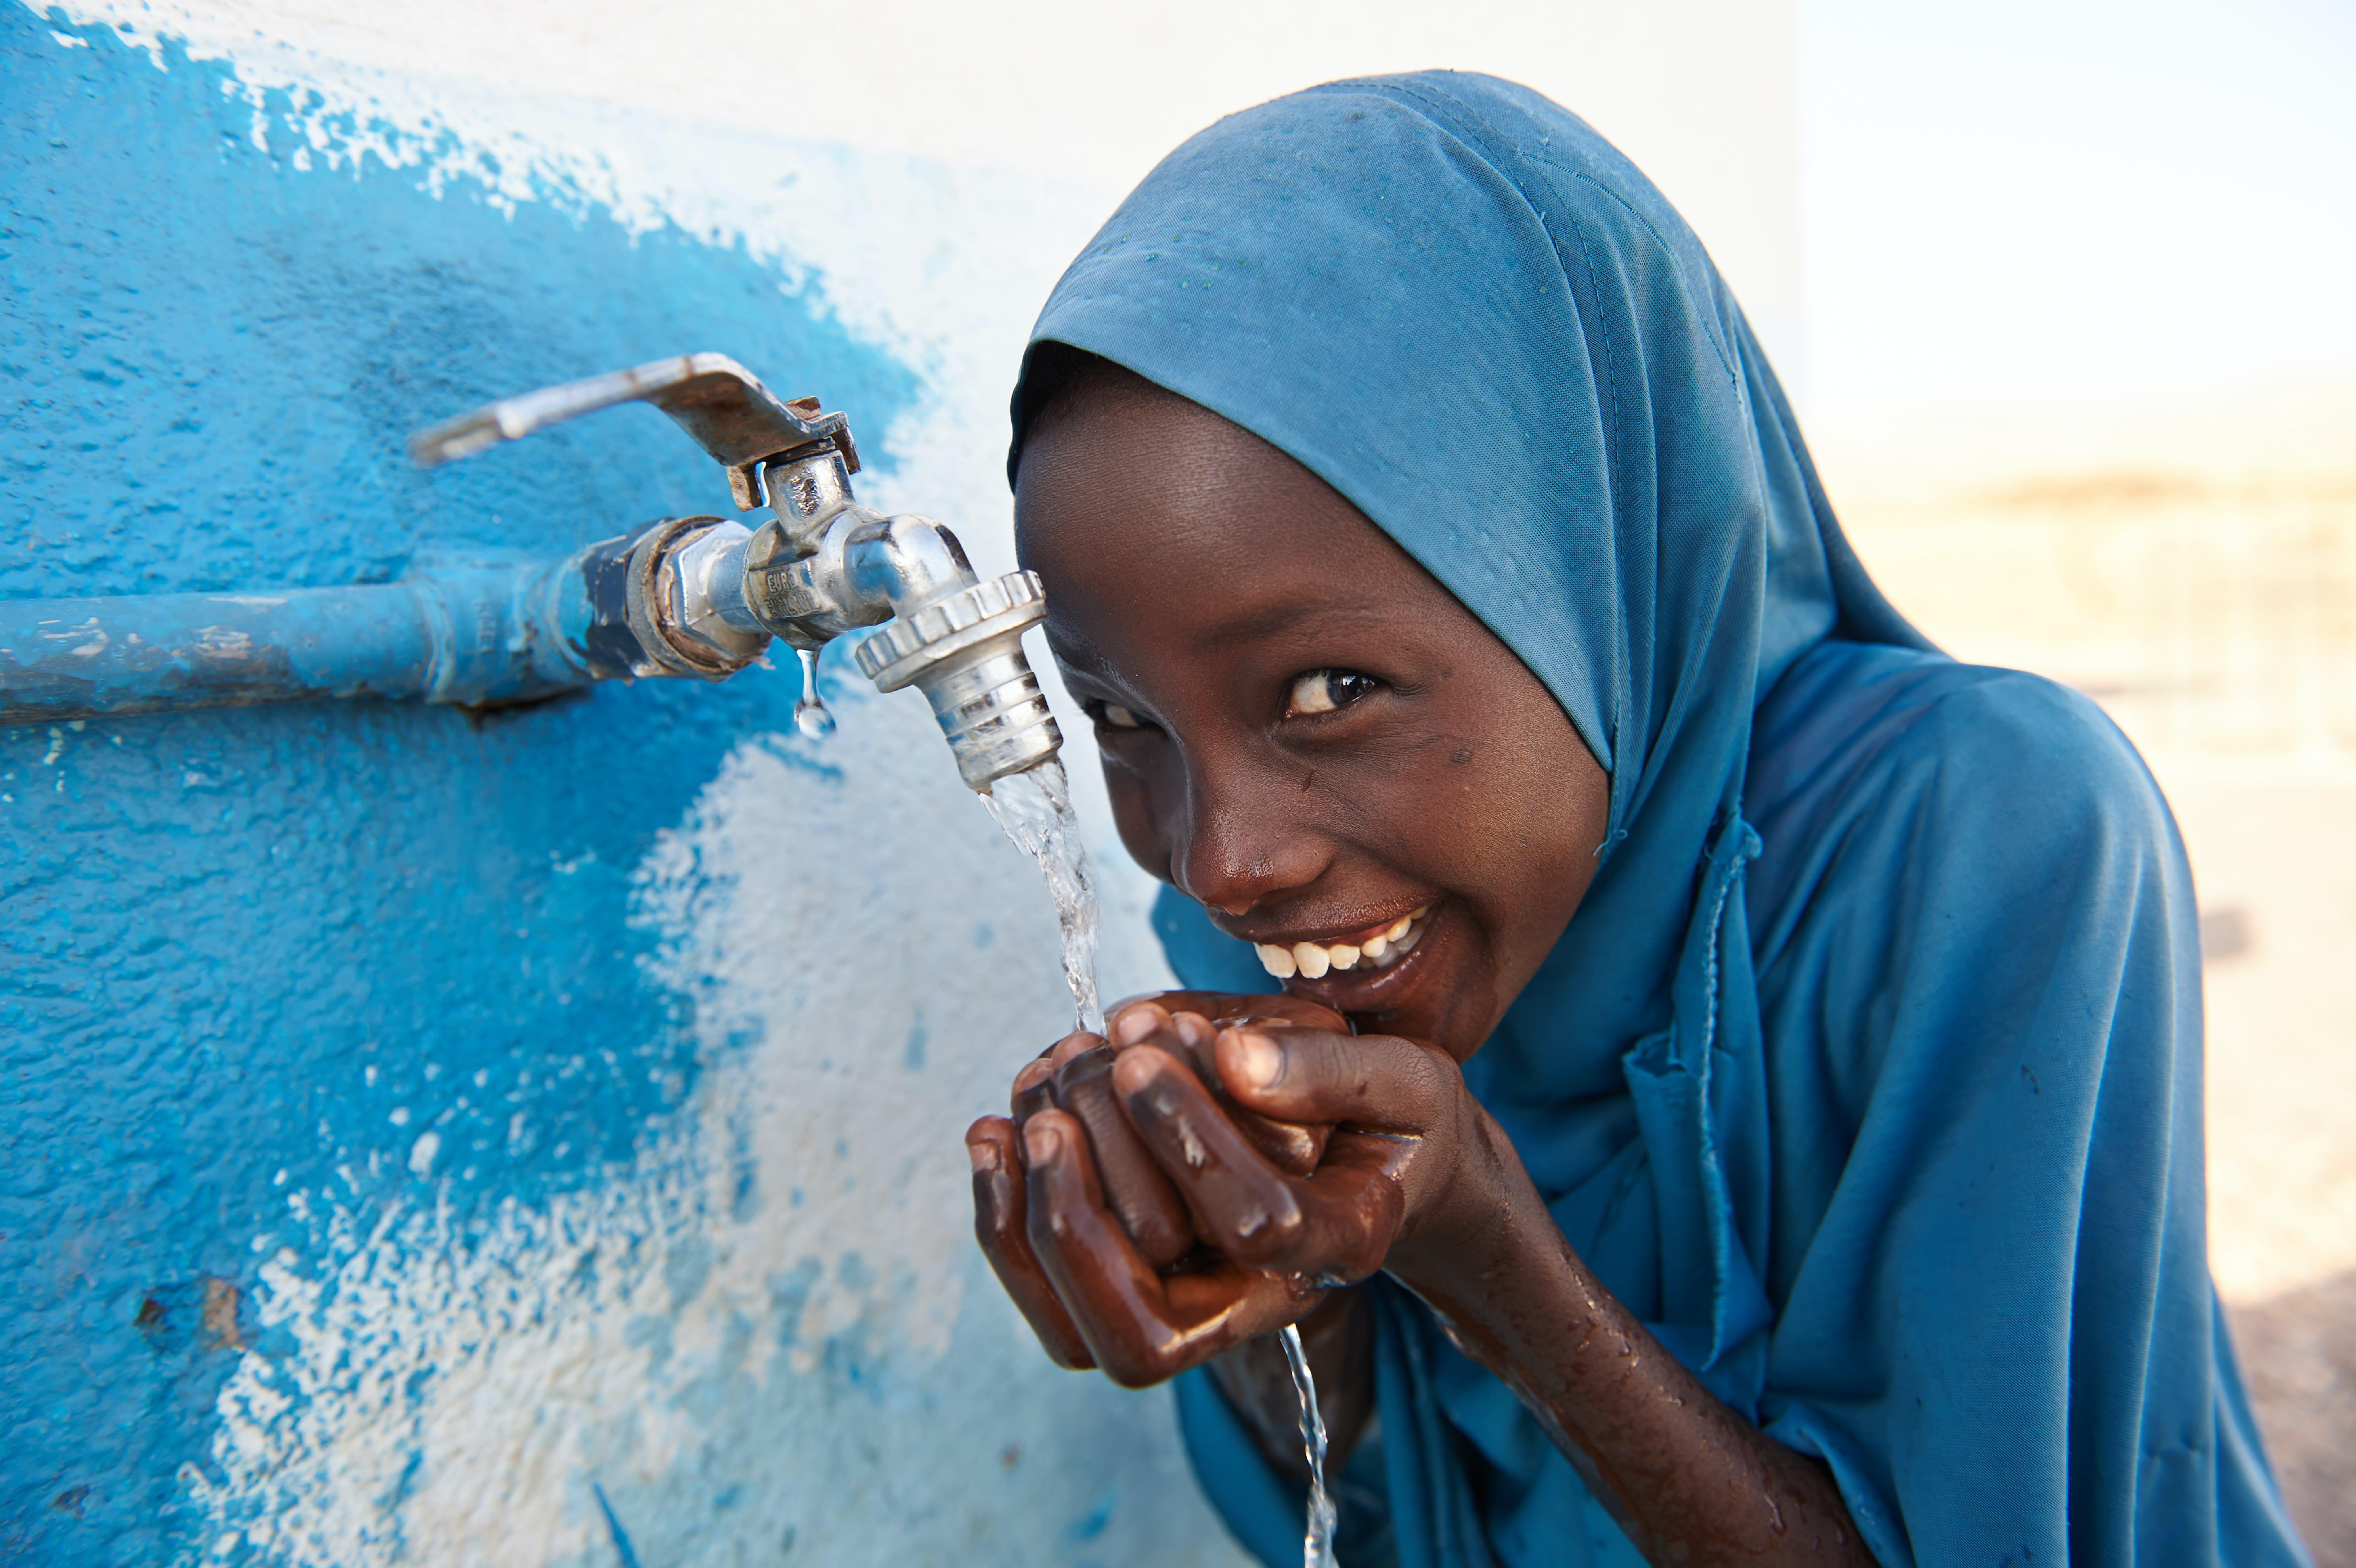 Bambina sorridente beve ad una fontanella